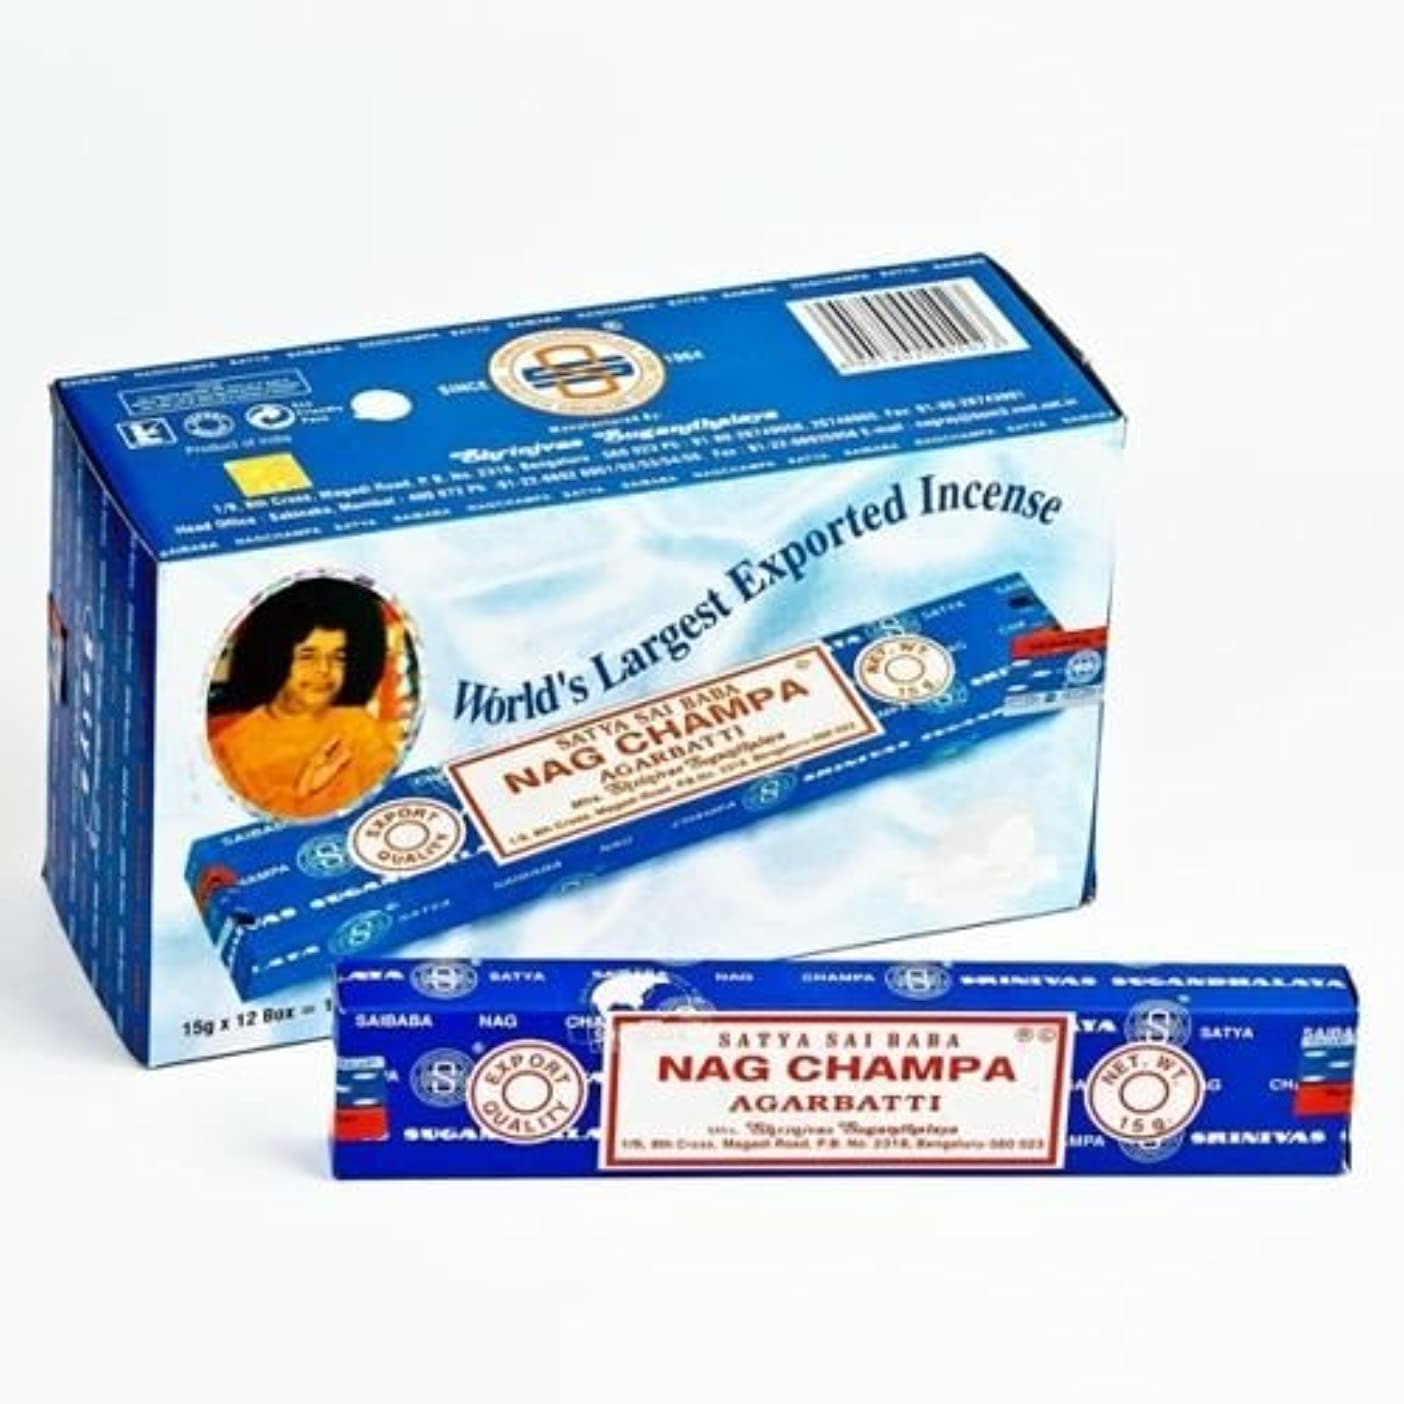 罪悪感虚偽導出Nag Champa incense sticks 15G X 12 BOX = 180G